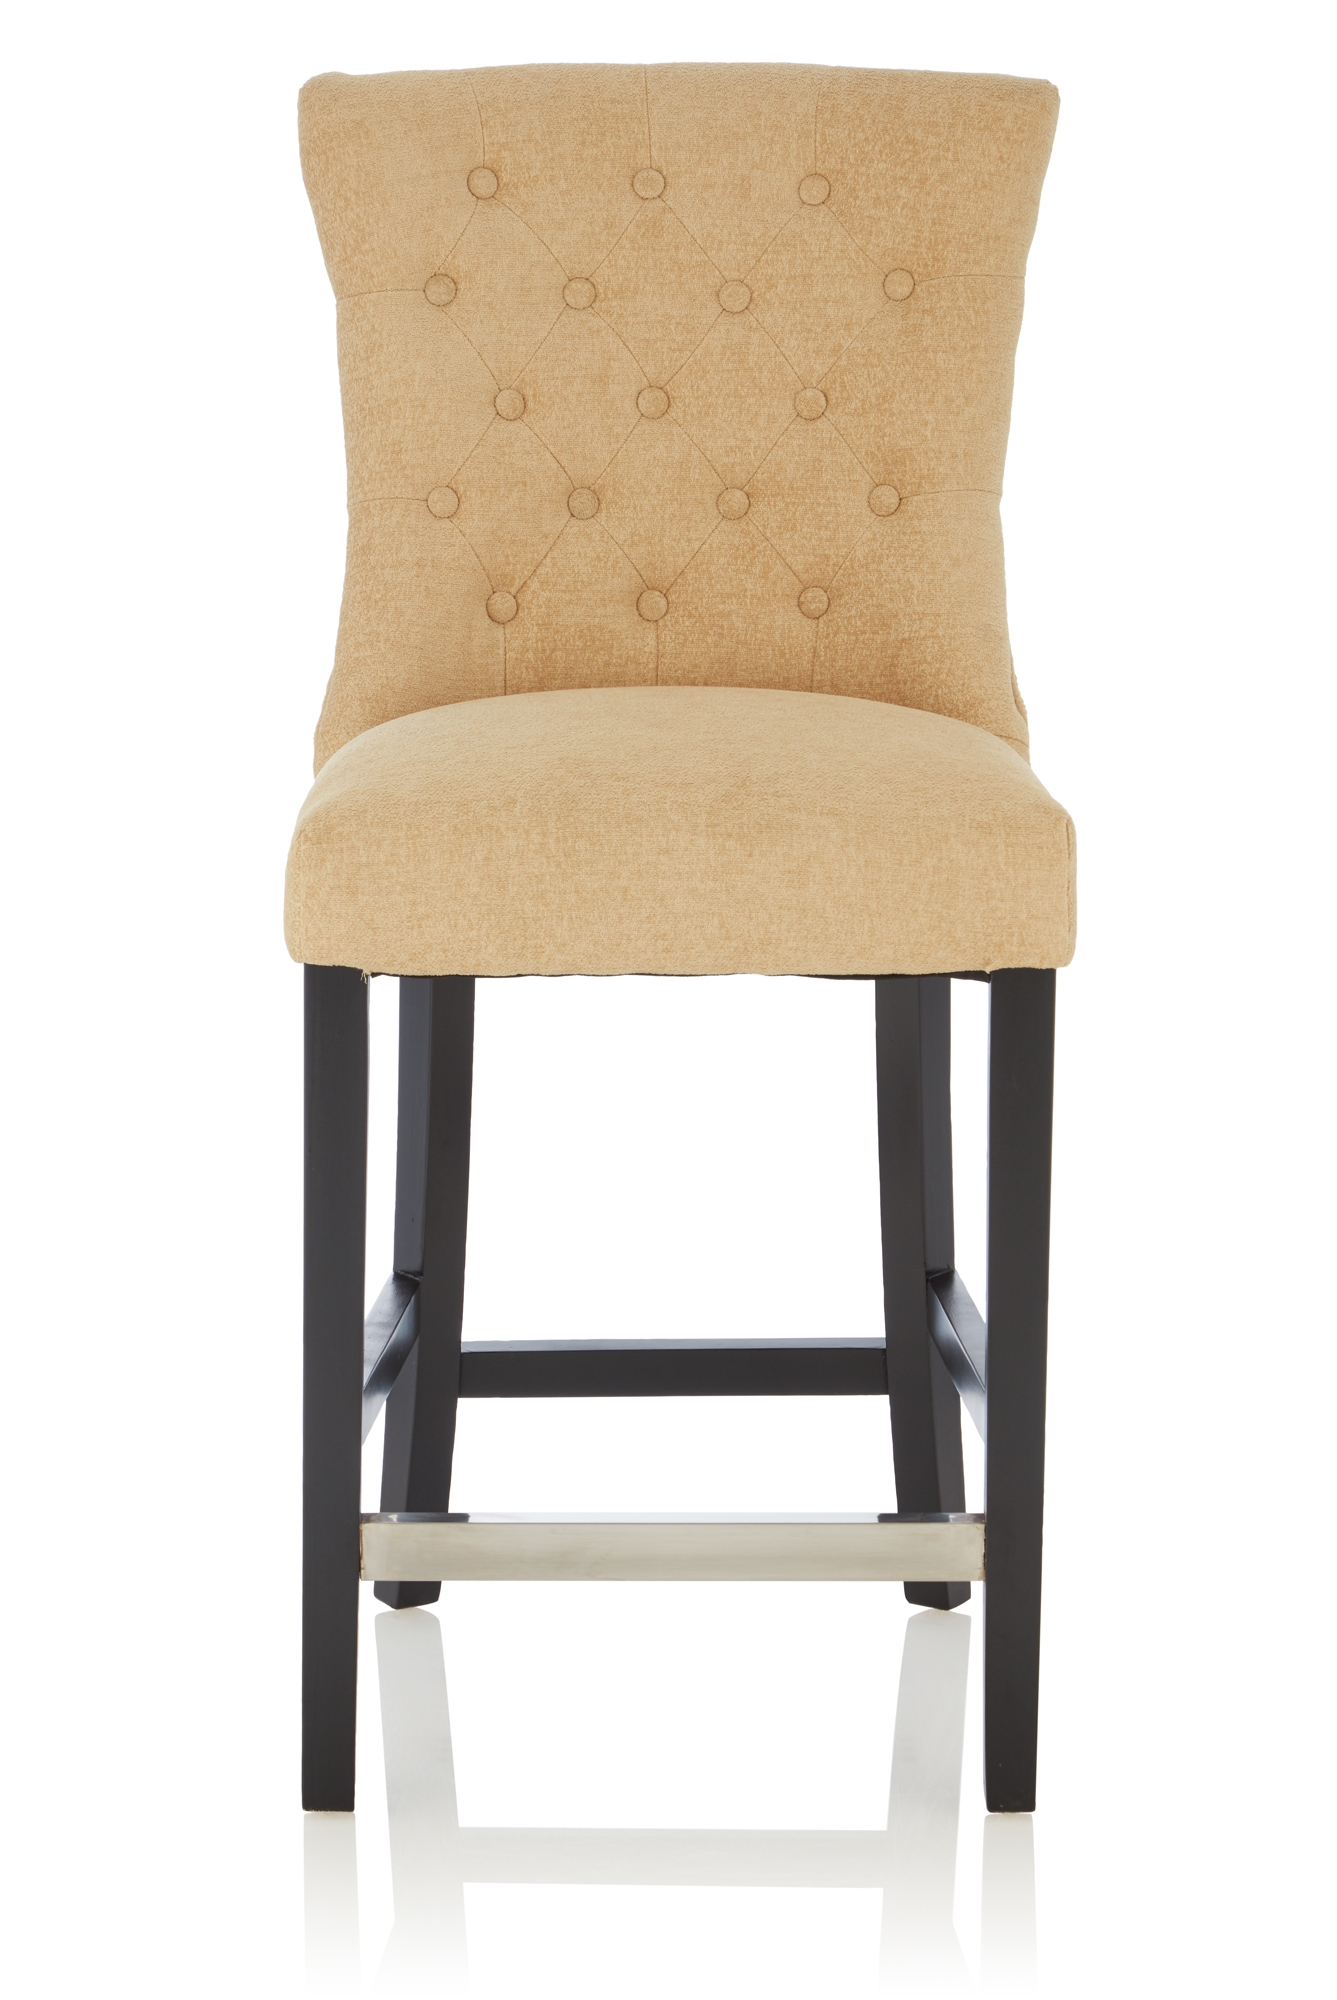 Serene Valerian Oatmeal Fabric Barstool with Black Legs (Set of 2)